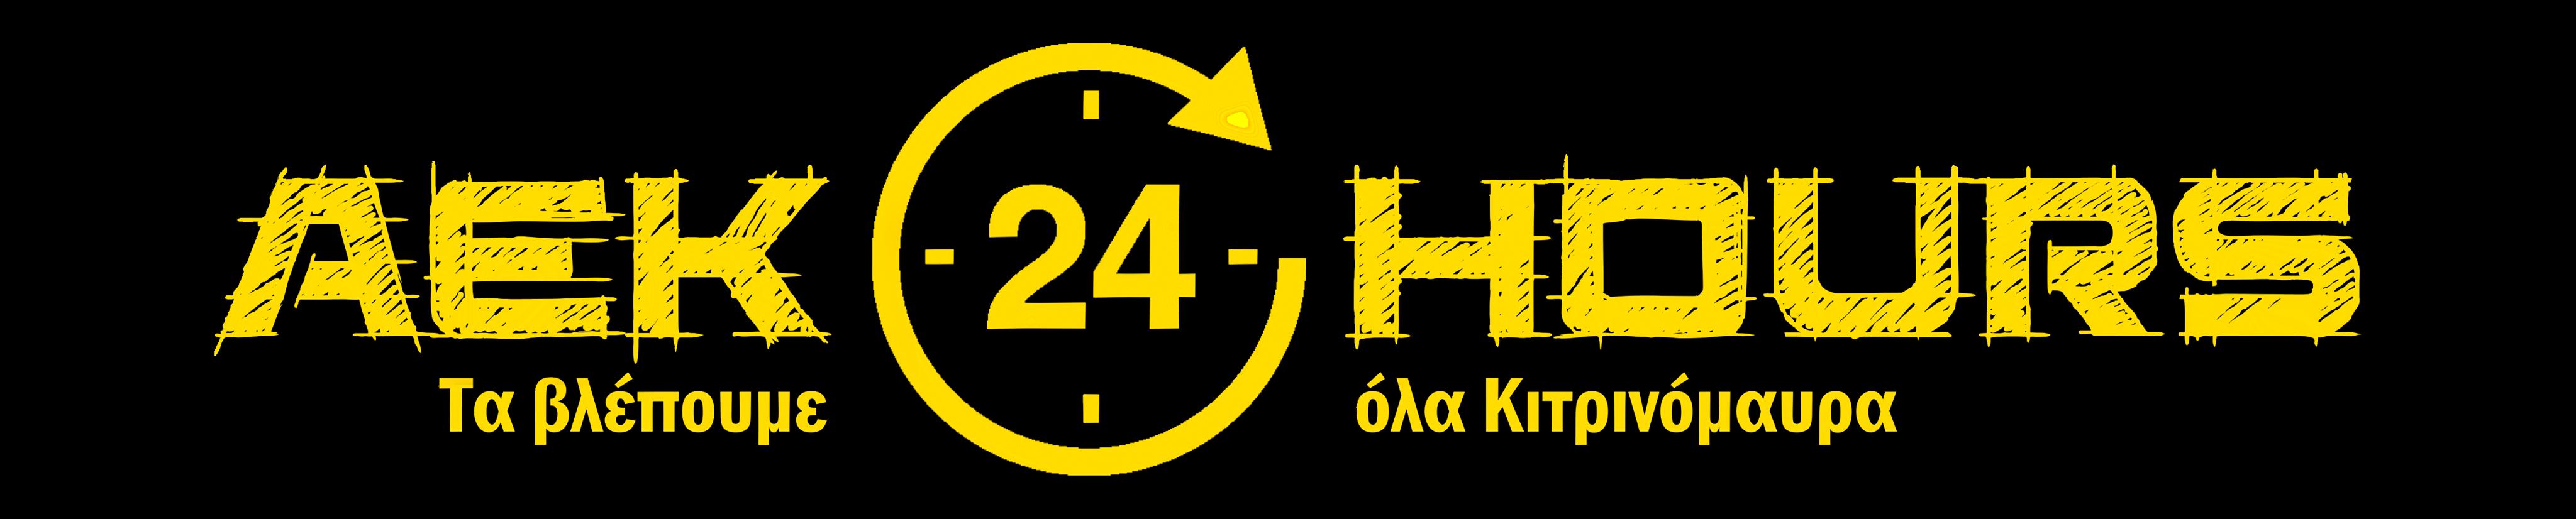 AEK24HOURS